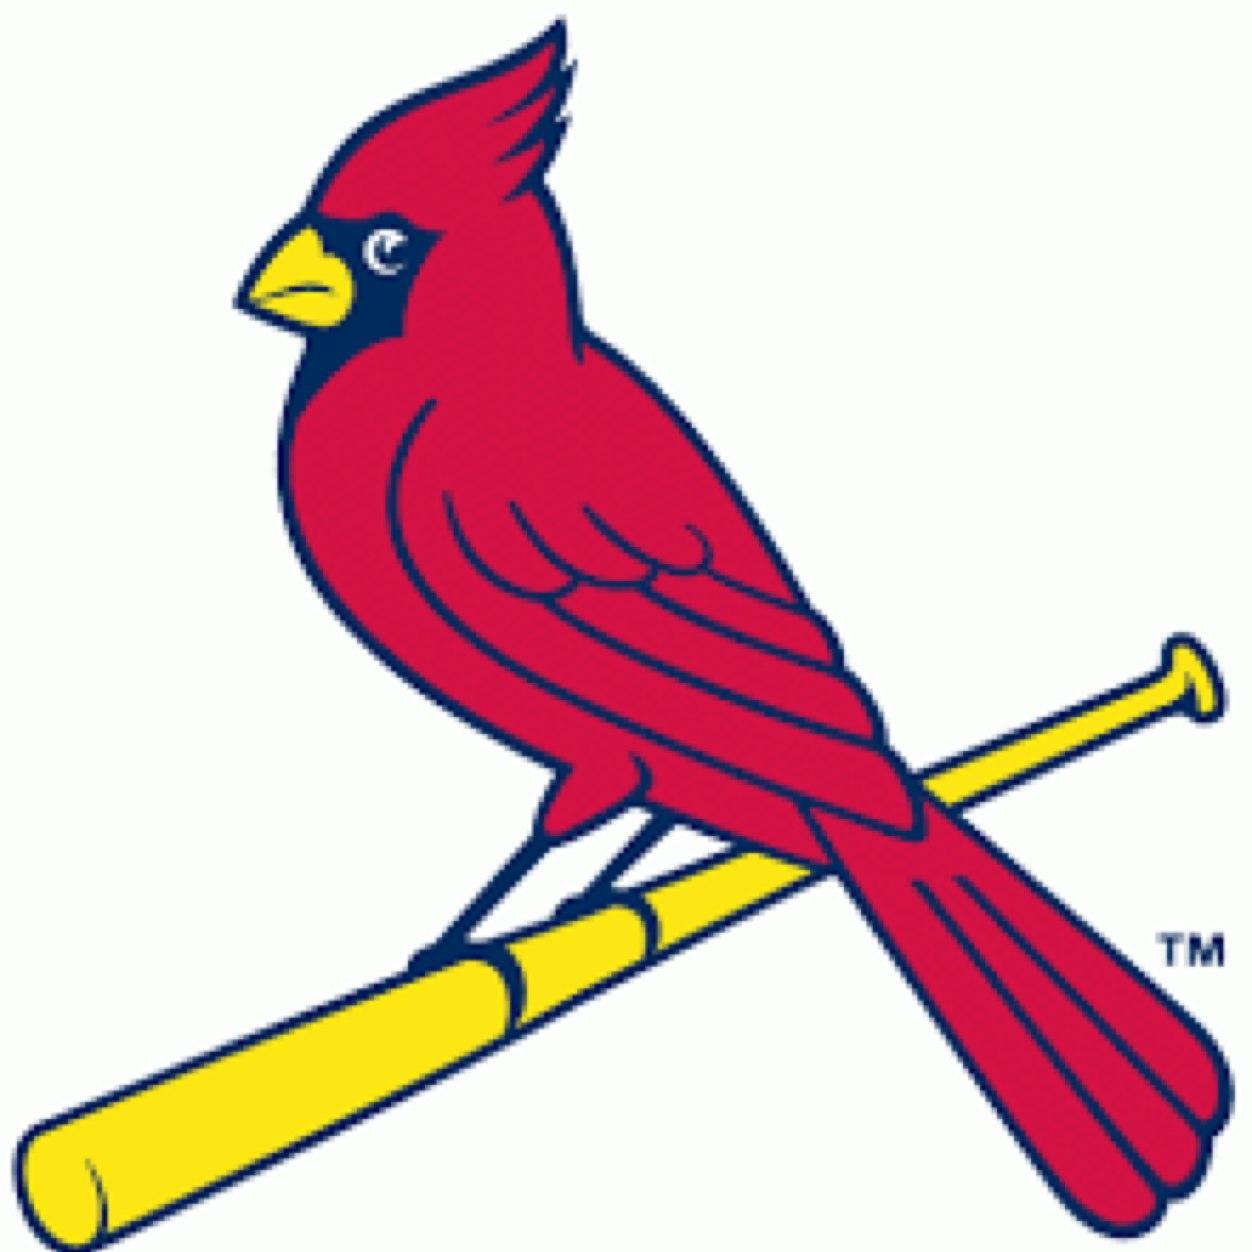 cardinals baseball clipart at getdrawings com free for personal rh getdrawings com st louis cardinals logo clip art